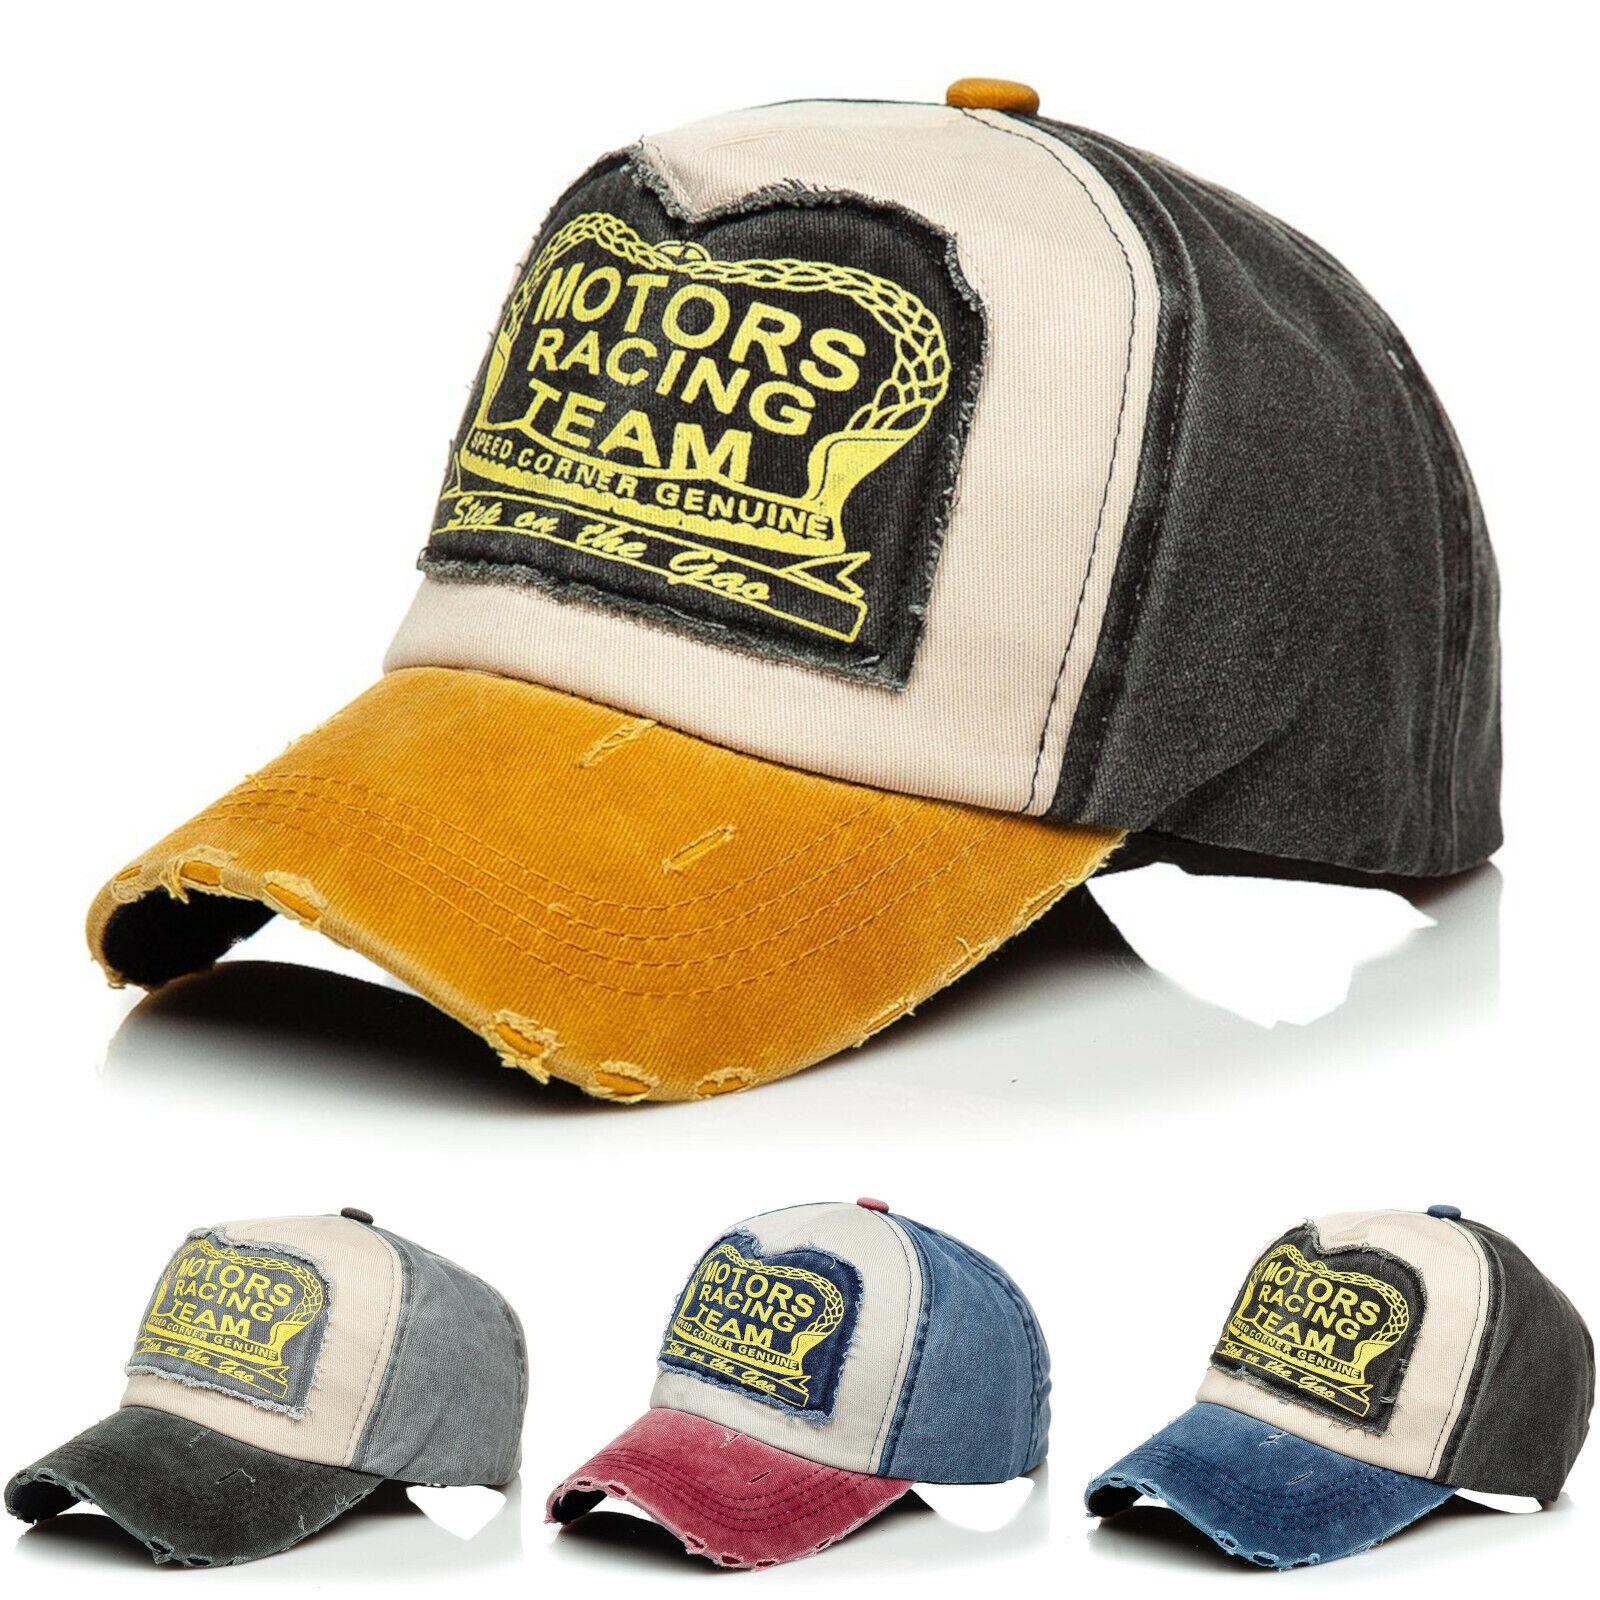 5daefa9784 Mütze Baseball Schirmmütze Strapback Kappe Cap Hat Basecap Aufdruck Print  Motiv